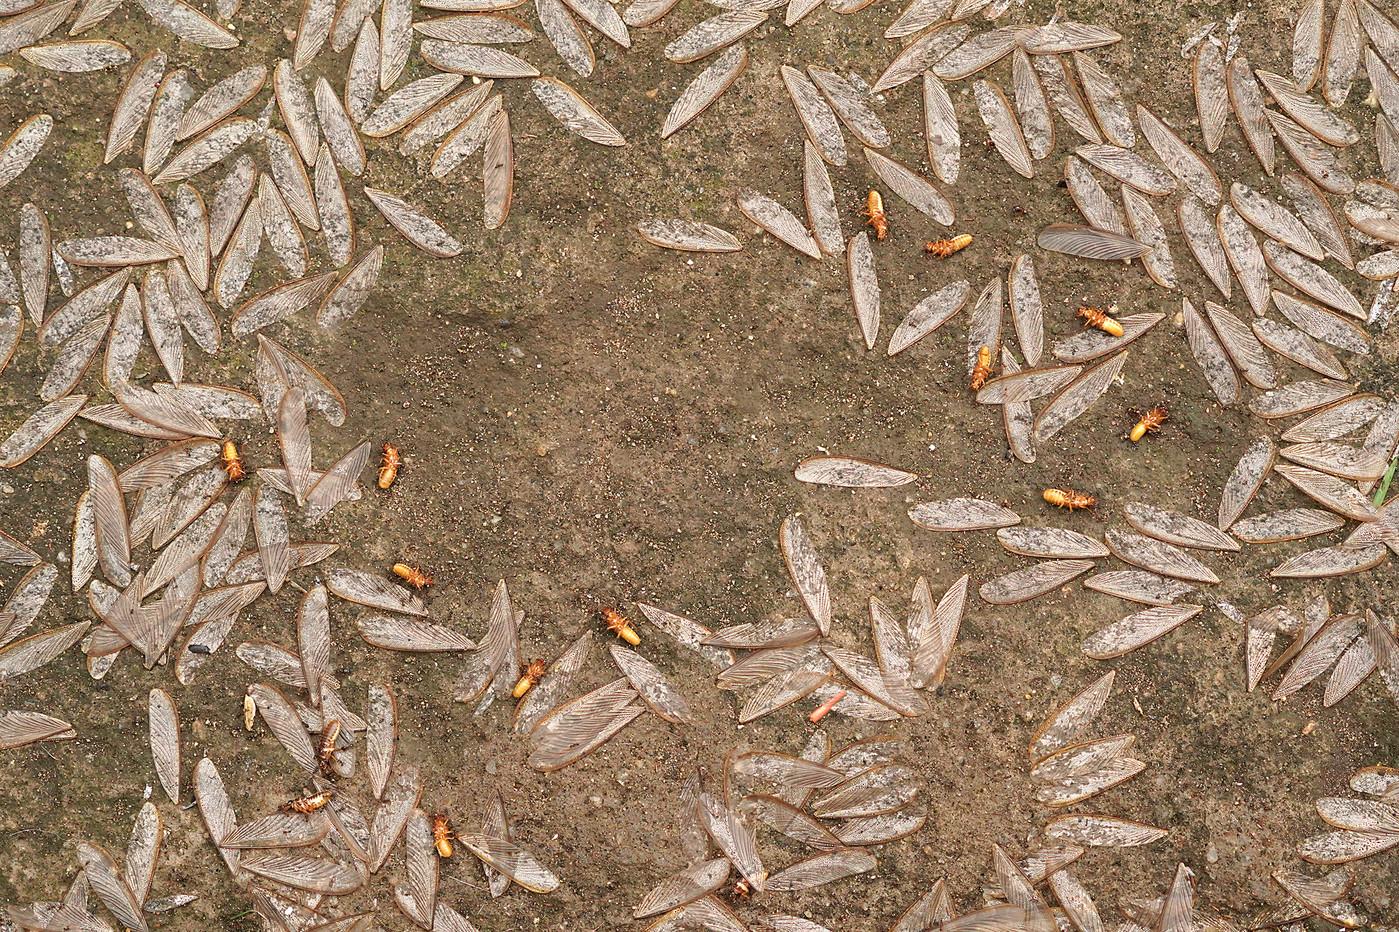 Flying termites in Arusha, Tanzania